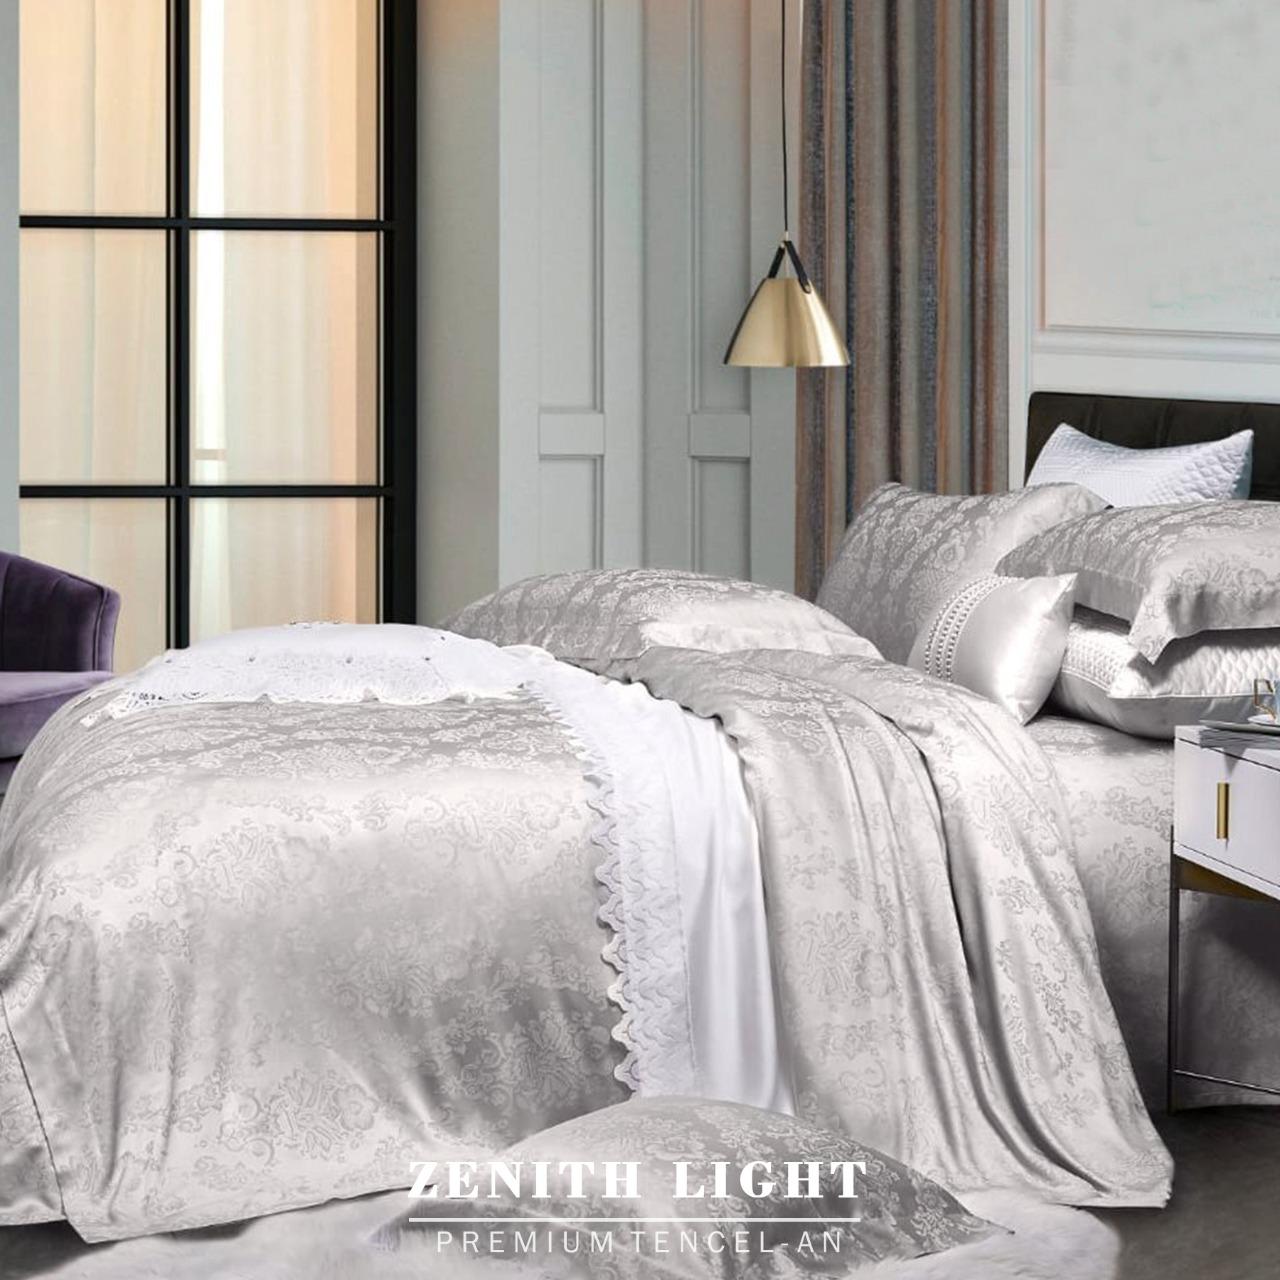 Zenith - Premium Tencel Bedding Set